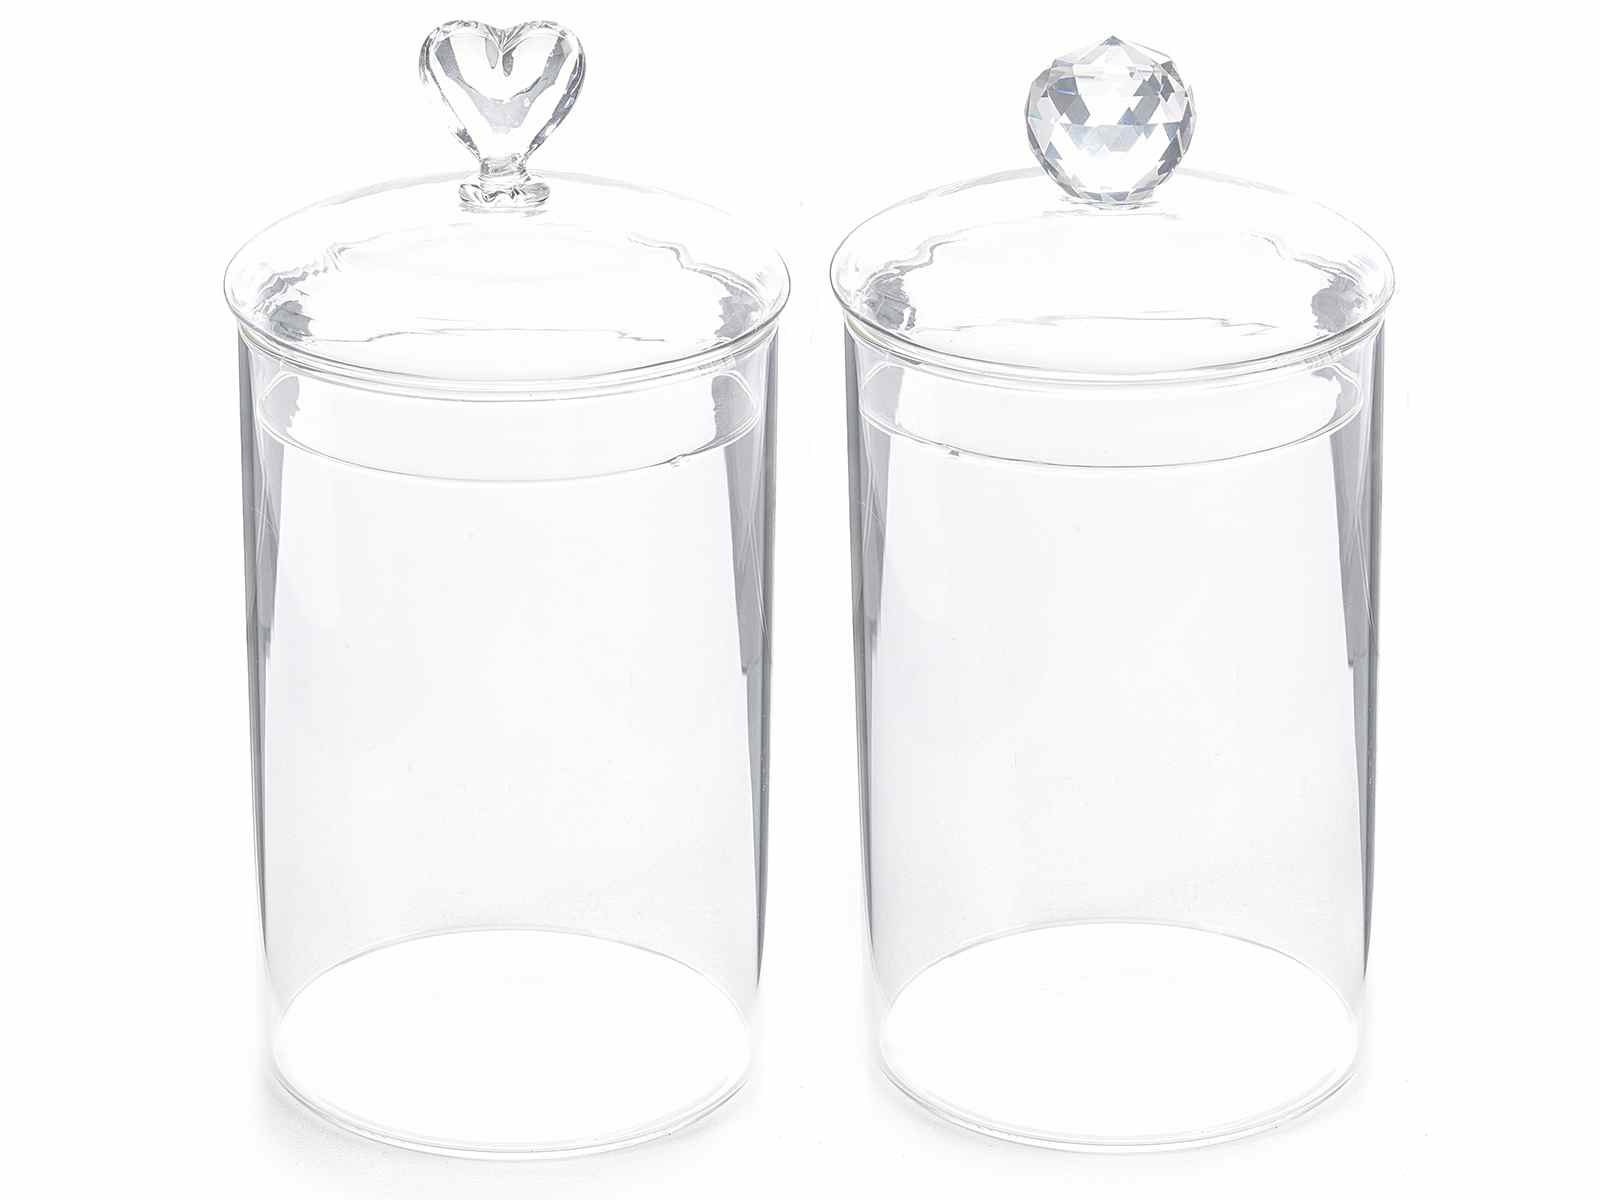 Tarro de vidrio transparente con tapa art from italy - Vidrio plastico transparente precio ...